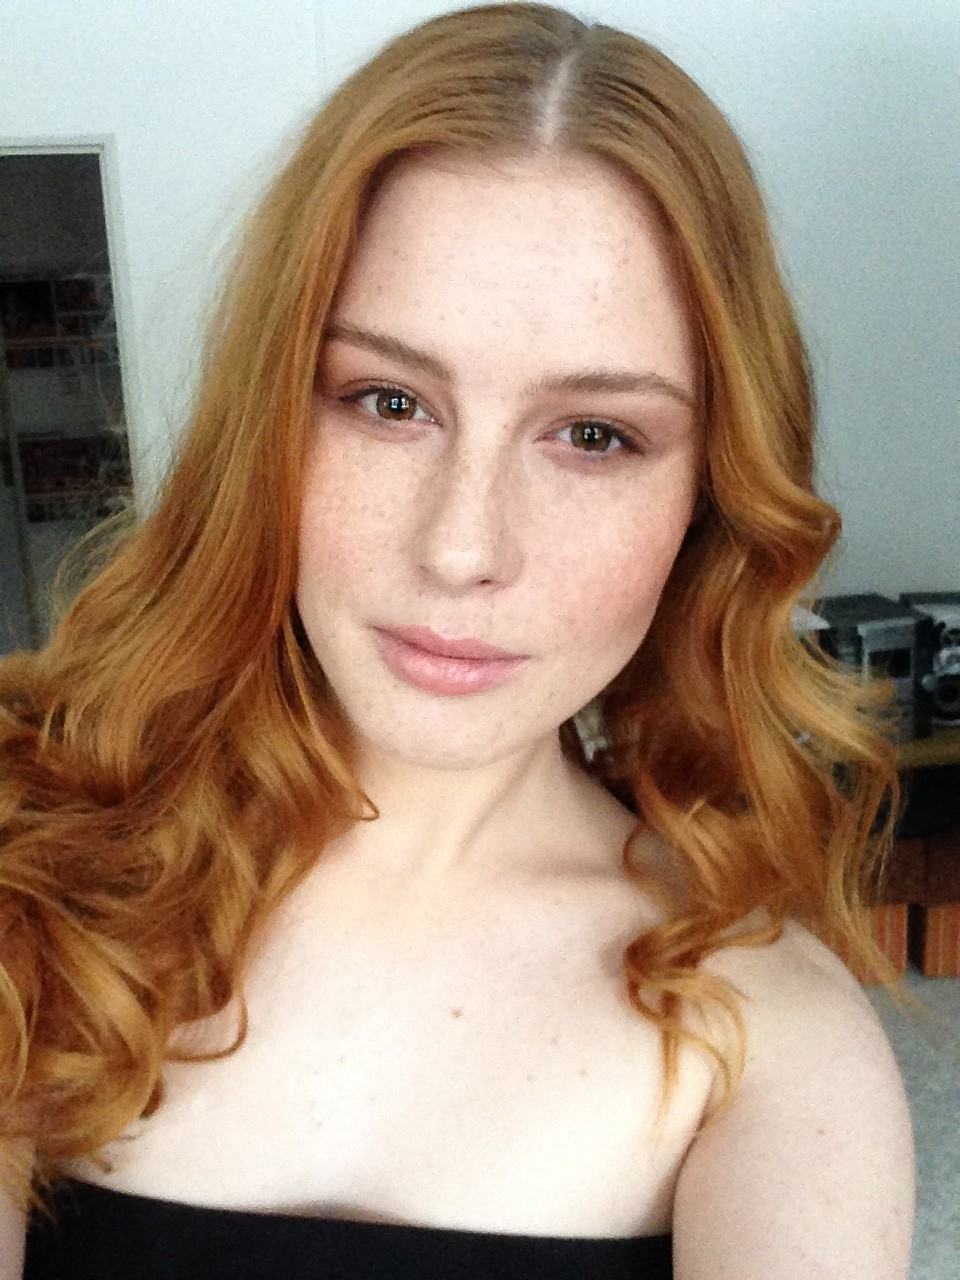 visage photoshoot lenka Regalová redhead freackles photoshoot